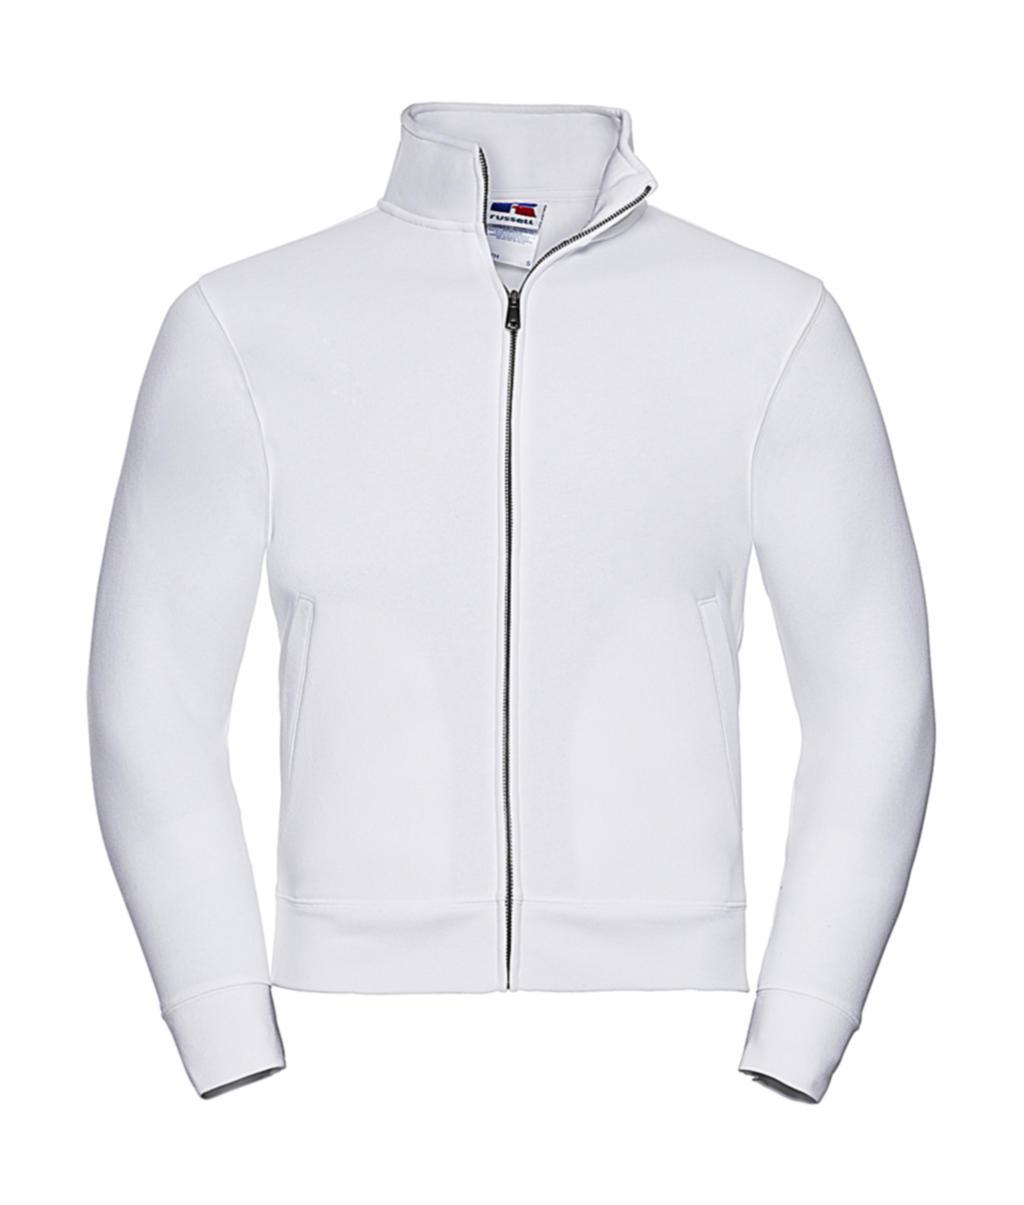 Men`s Authentic Sweat Jacket